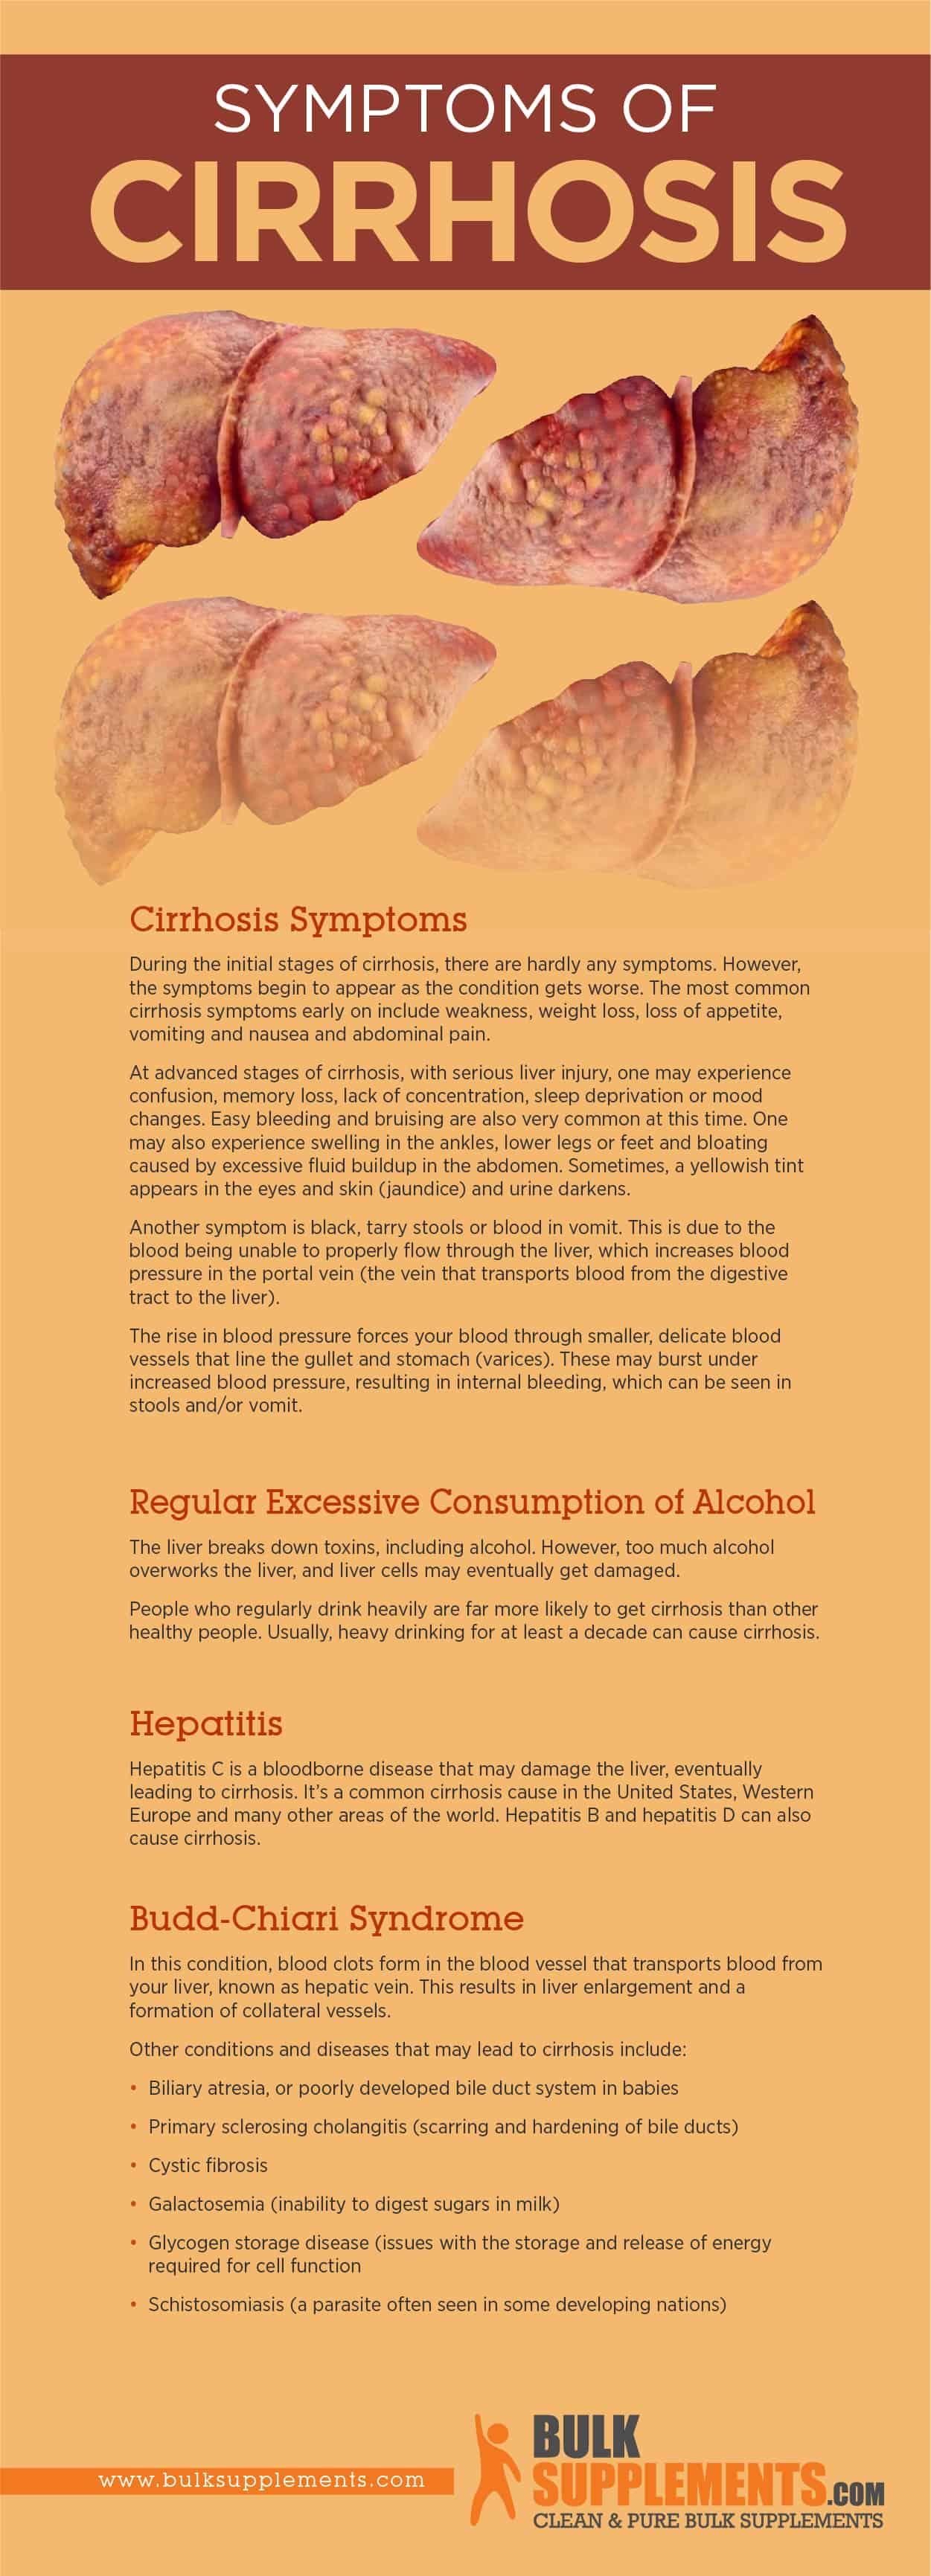 Cirrhosis Symptoms